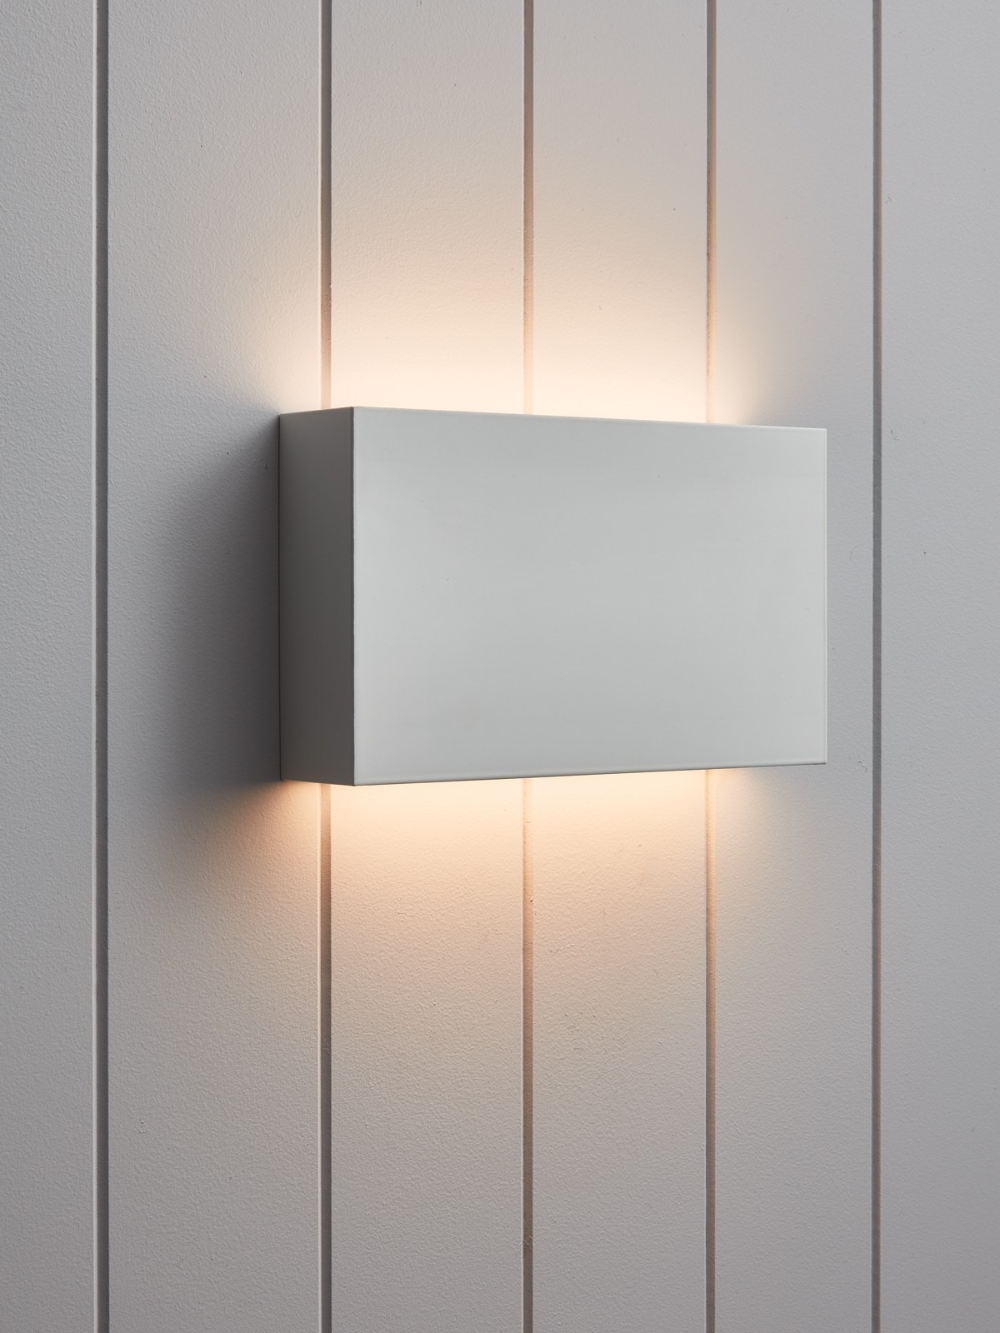 Ledlux Radia 20w Led Dimmable Wall Bracket In White In 2020 White Wall Lights Wall Brackets Wall Lights